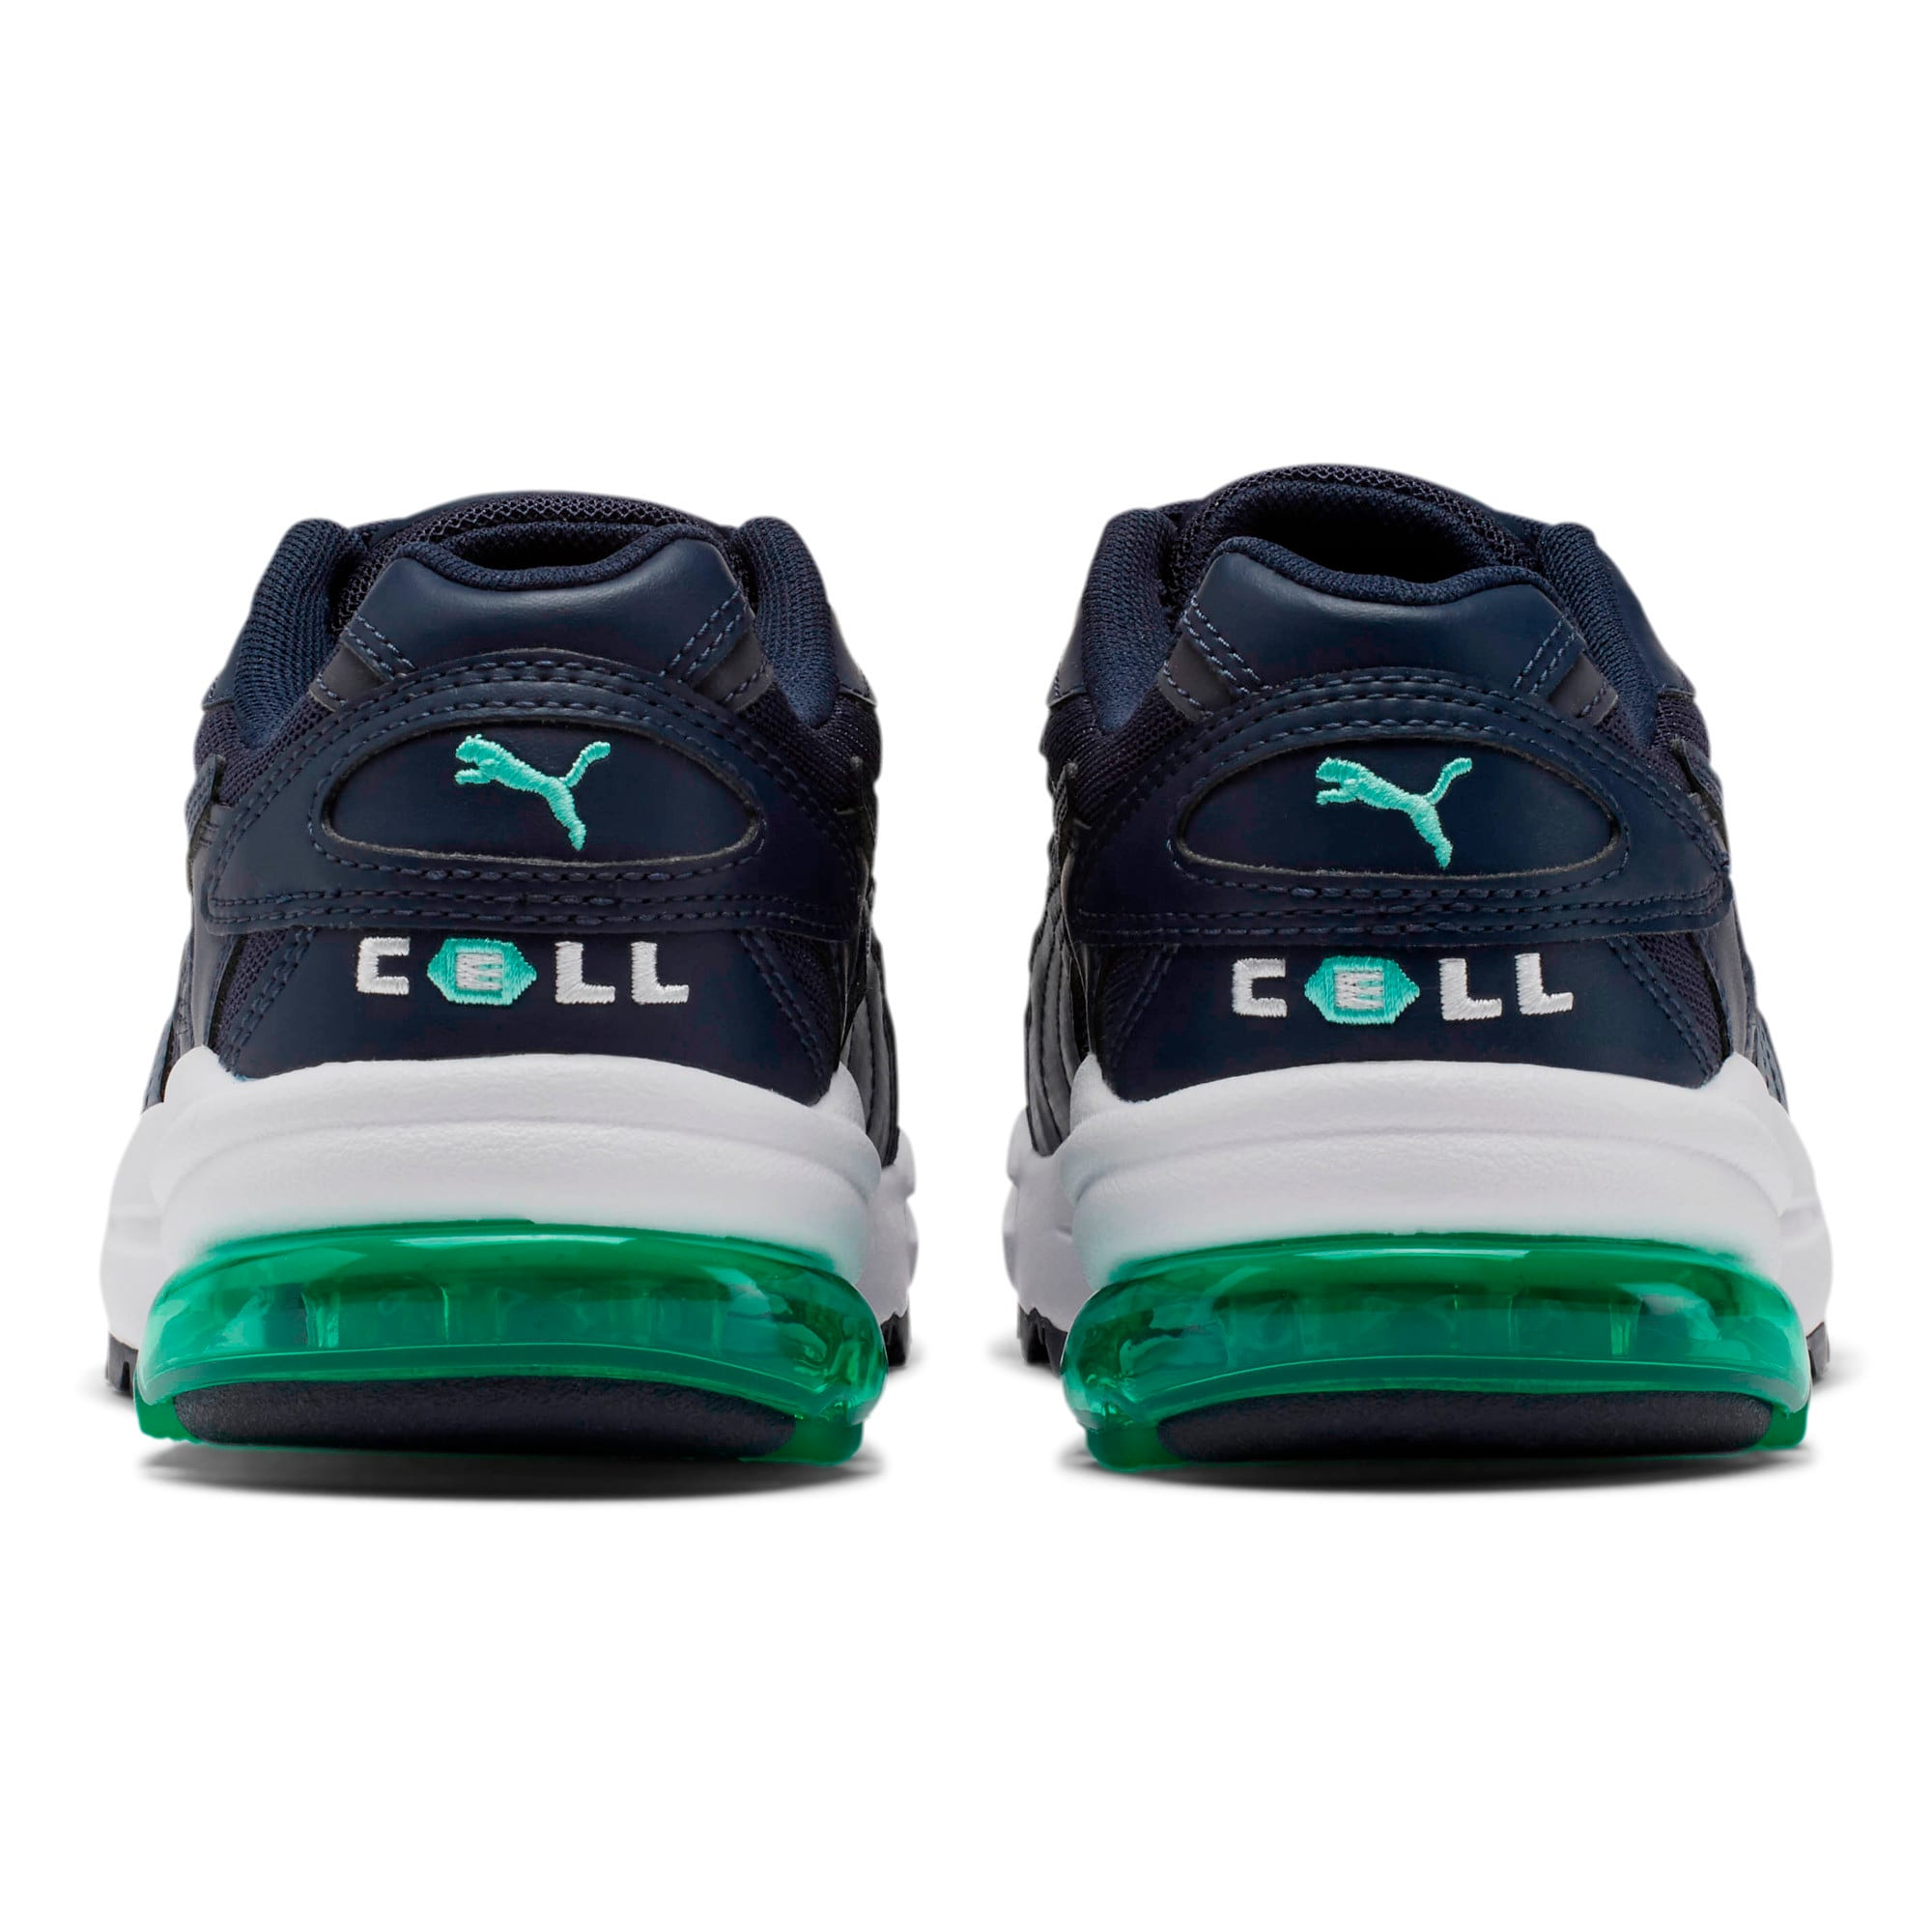 Thumbnail 3 of CELL Alien 51 Sneakers JR, Peacoat-Biscay Green, medium